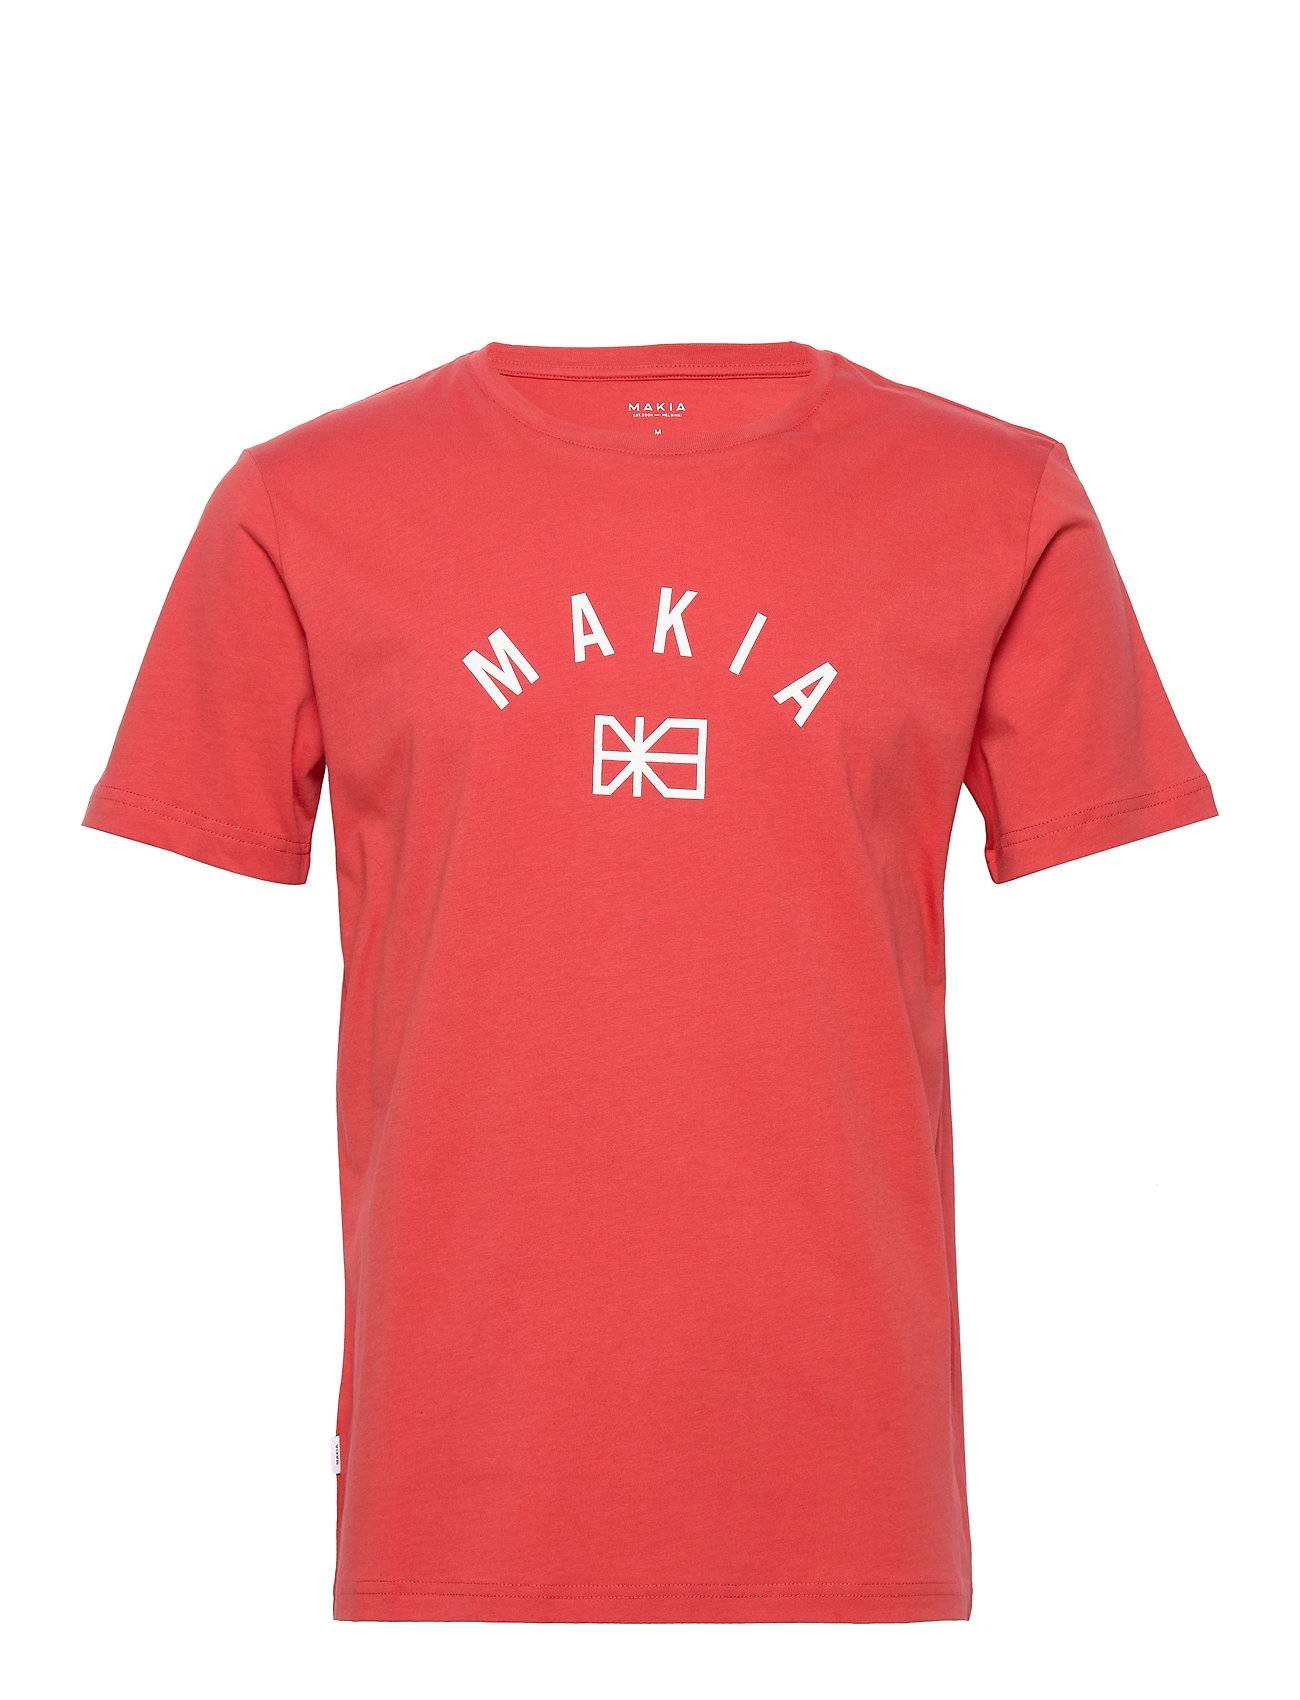 Makia Brand T-Shirt T-shirts Short-sleeved Punainen Makia